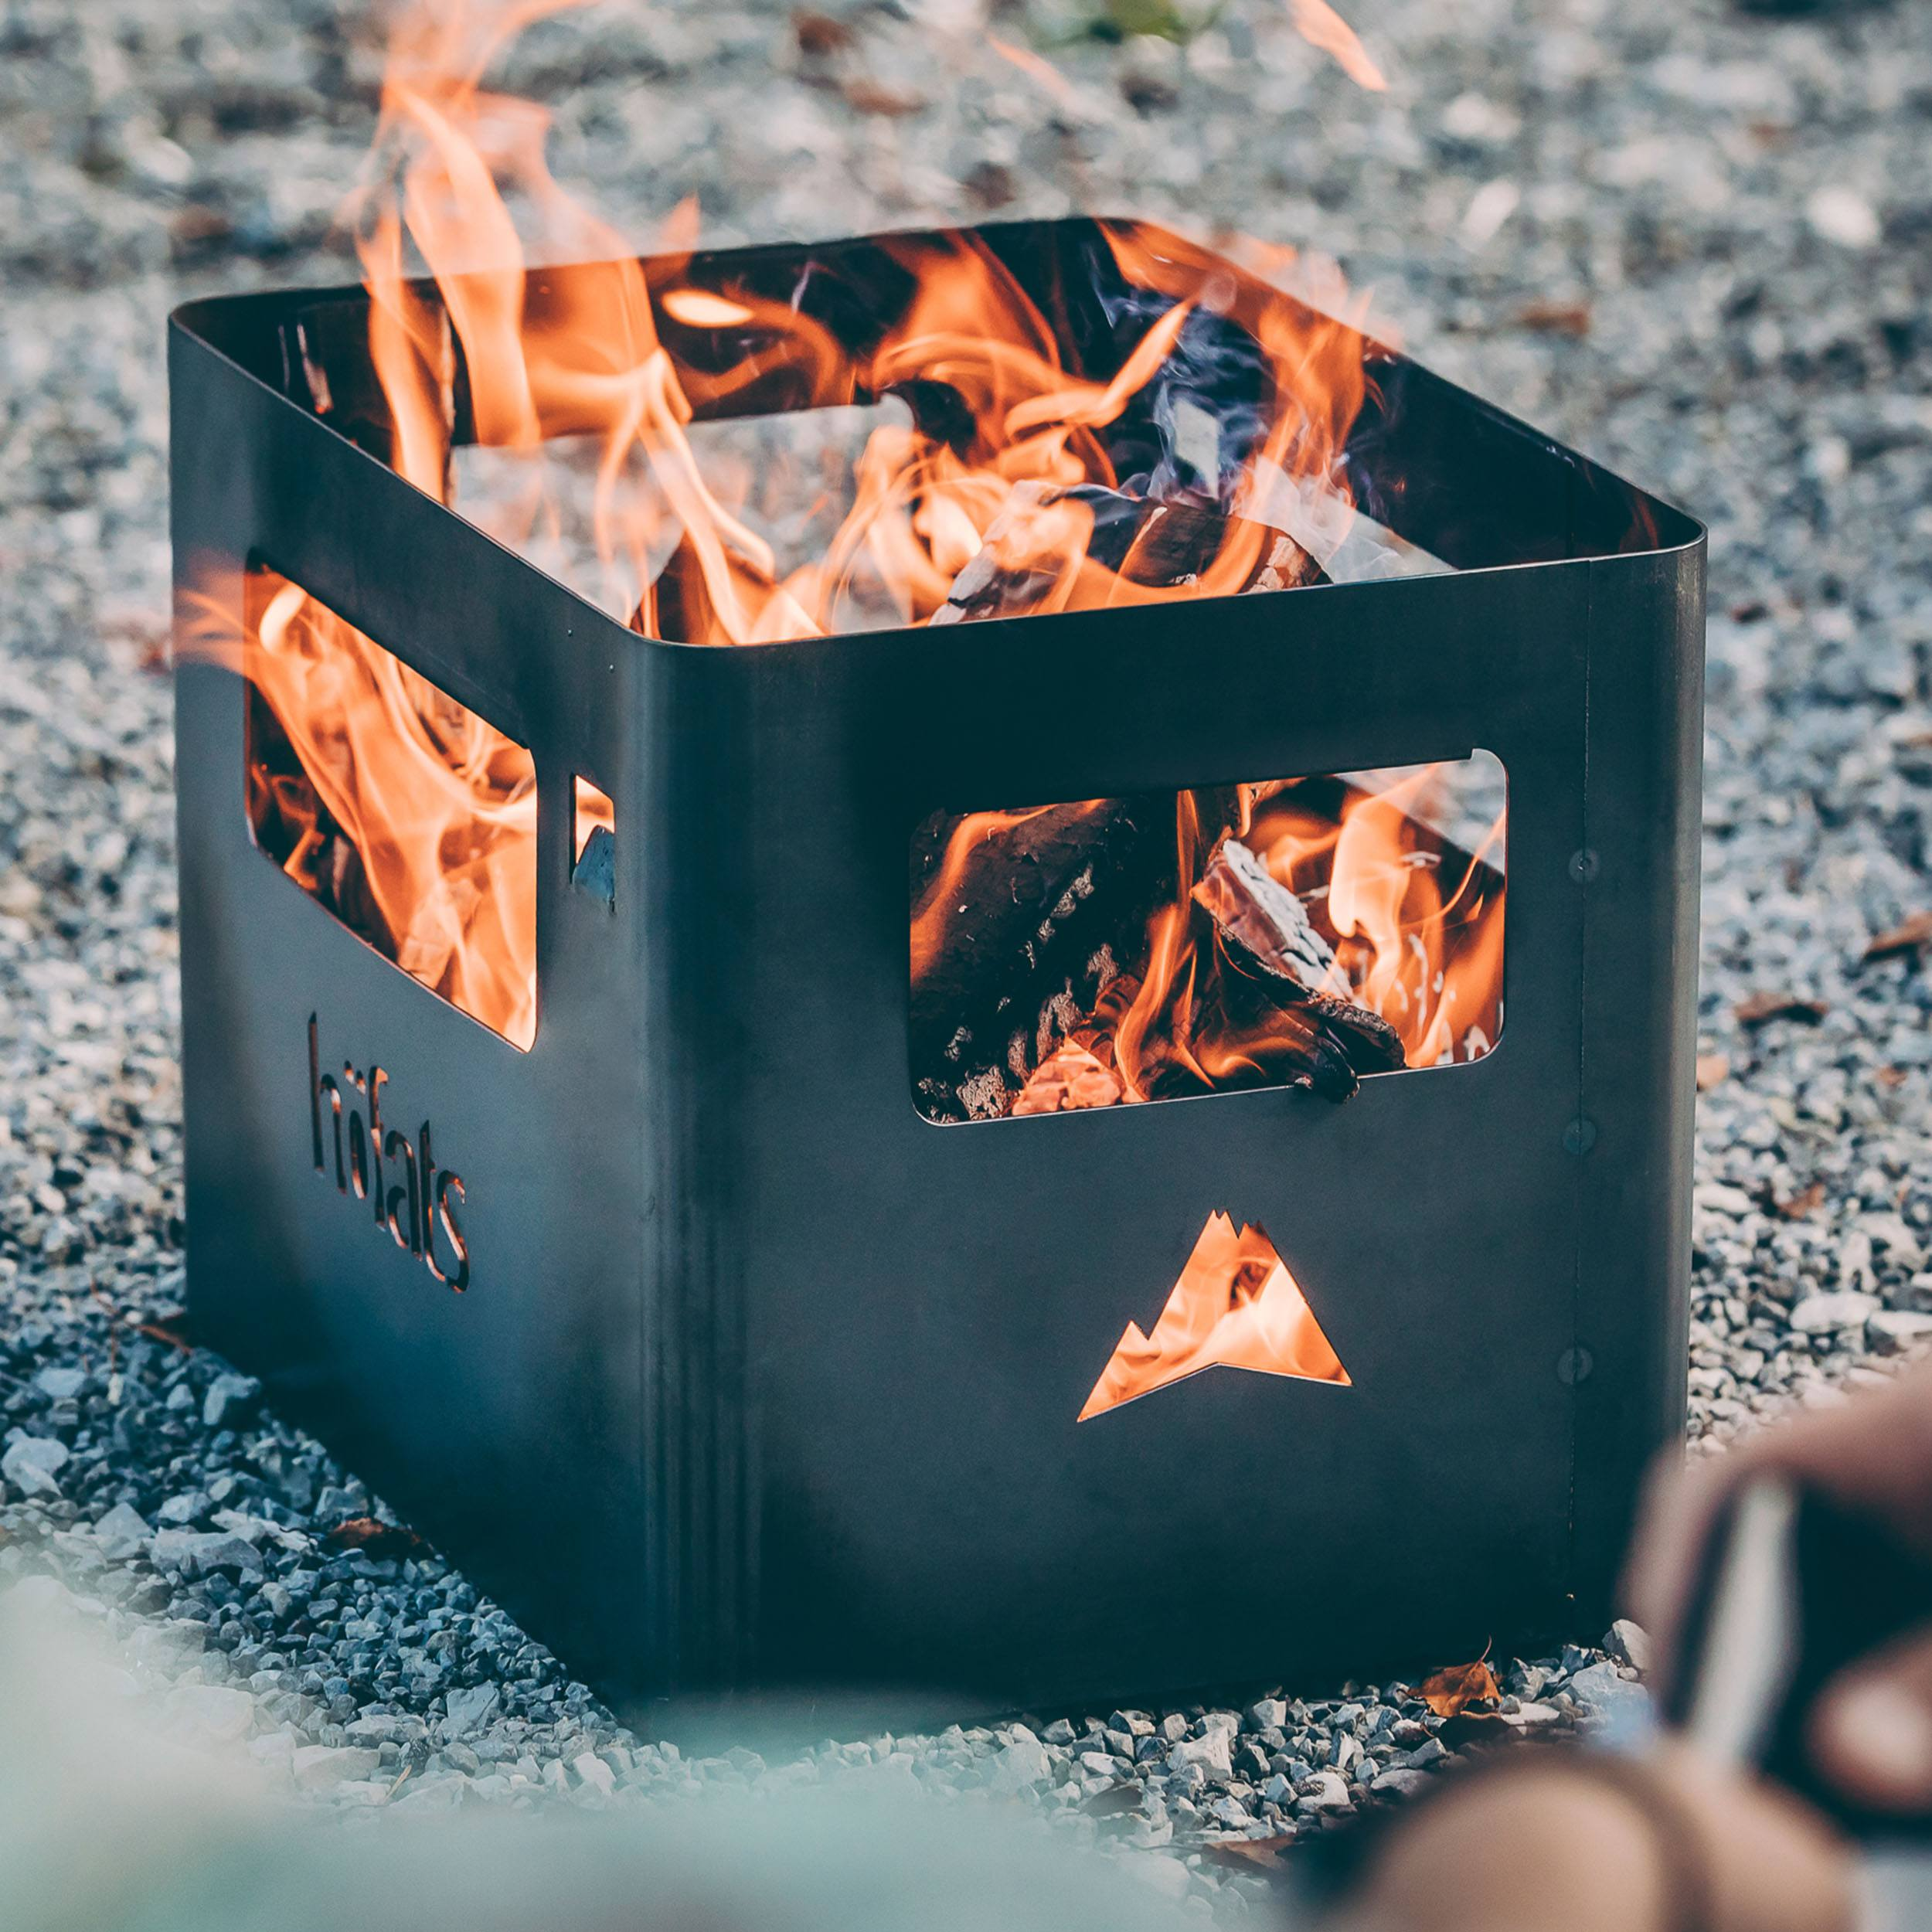 Beer Box Feuerkorb